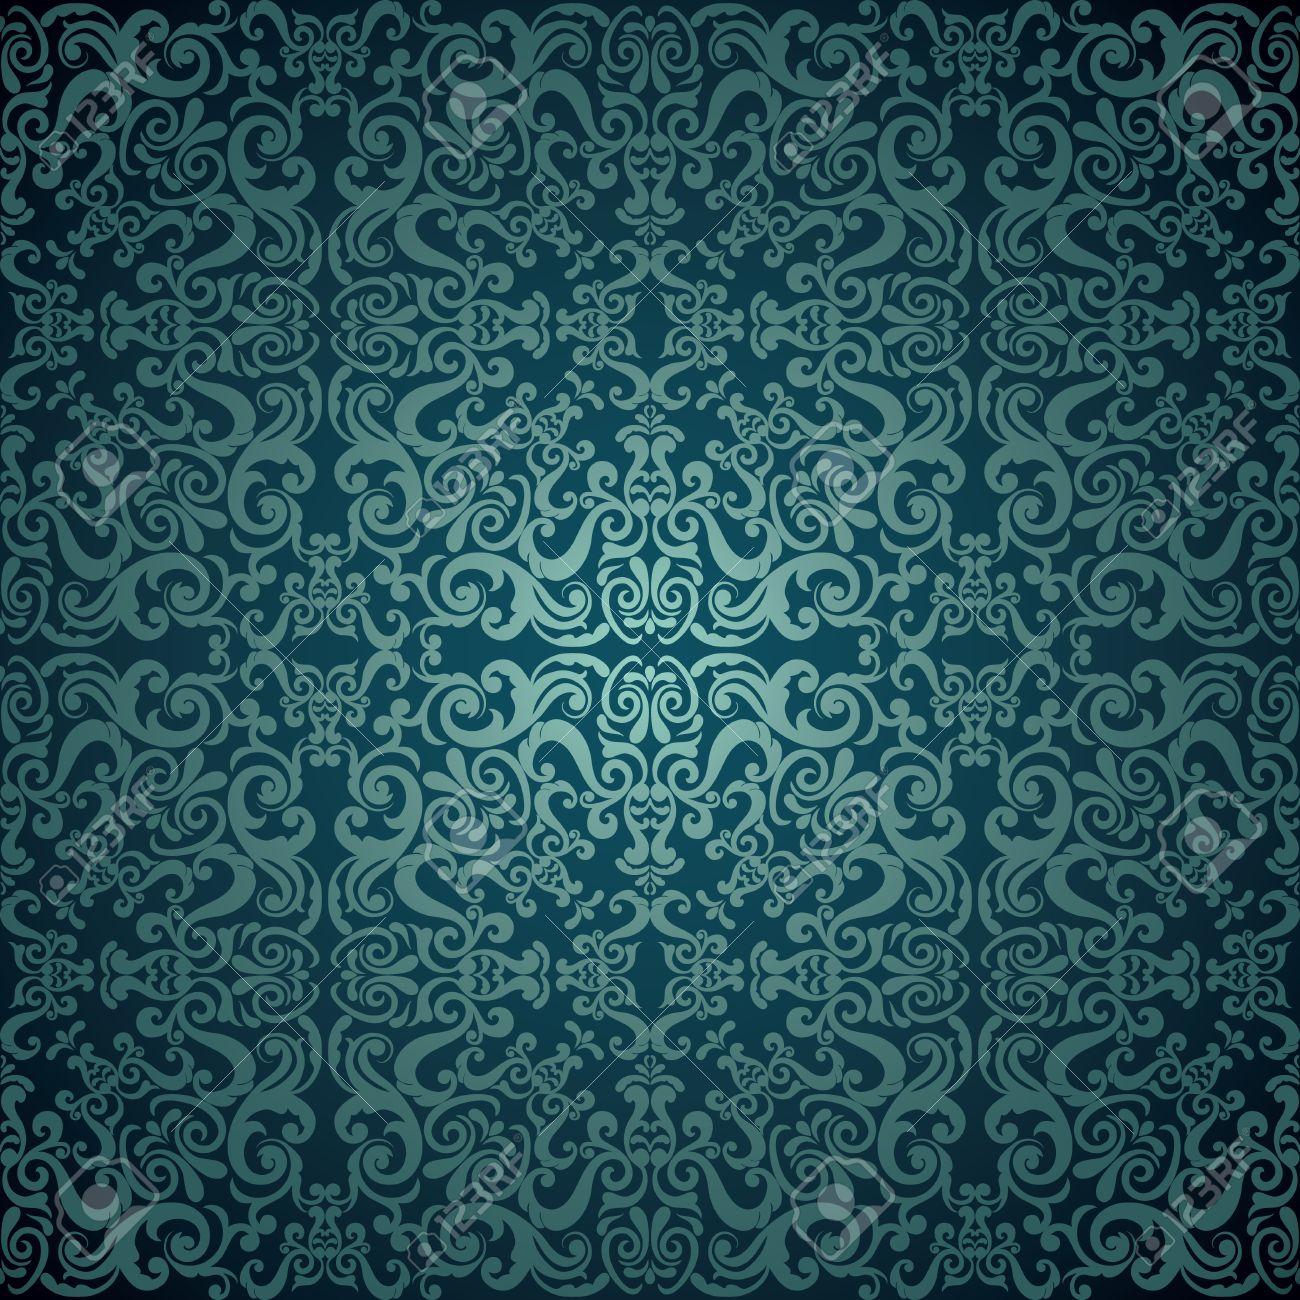 Damask Wallpaper Blue Design Stock Vector